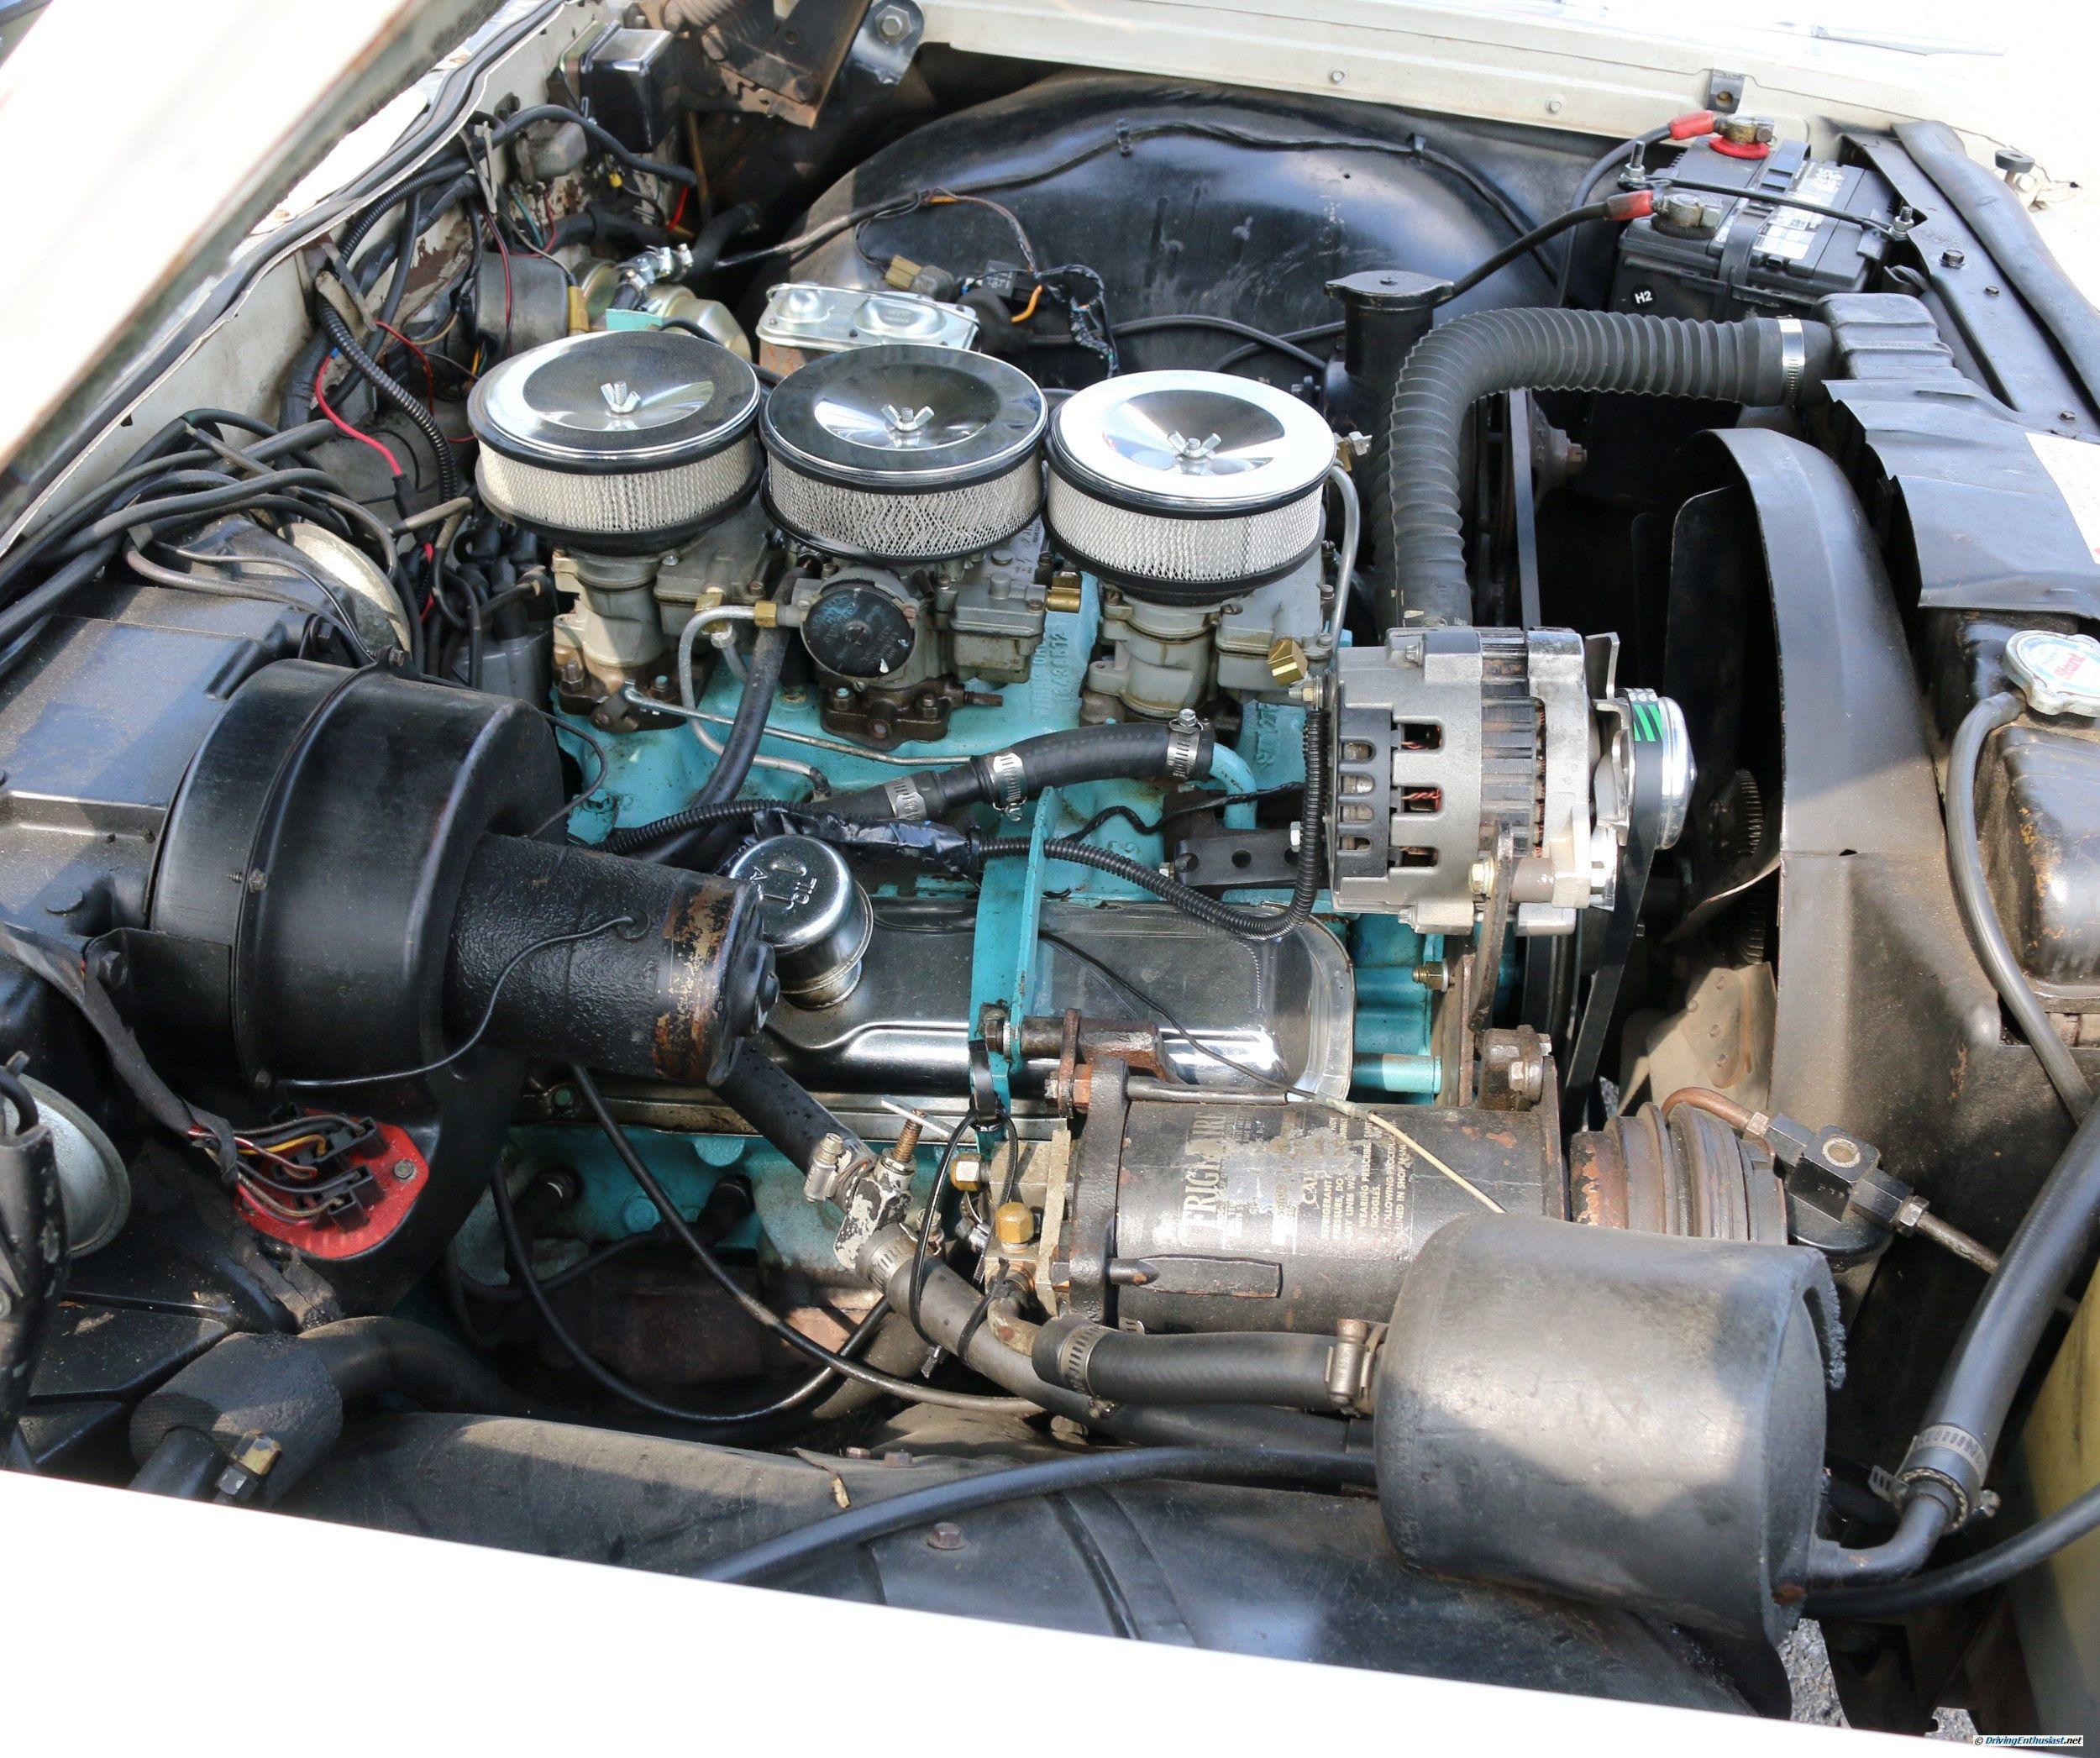 1962 Pontiac Grand Prix. Rare options include 4-speed manual w/Hurst package